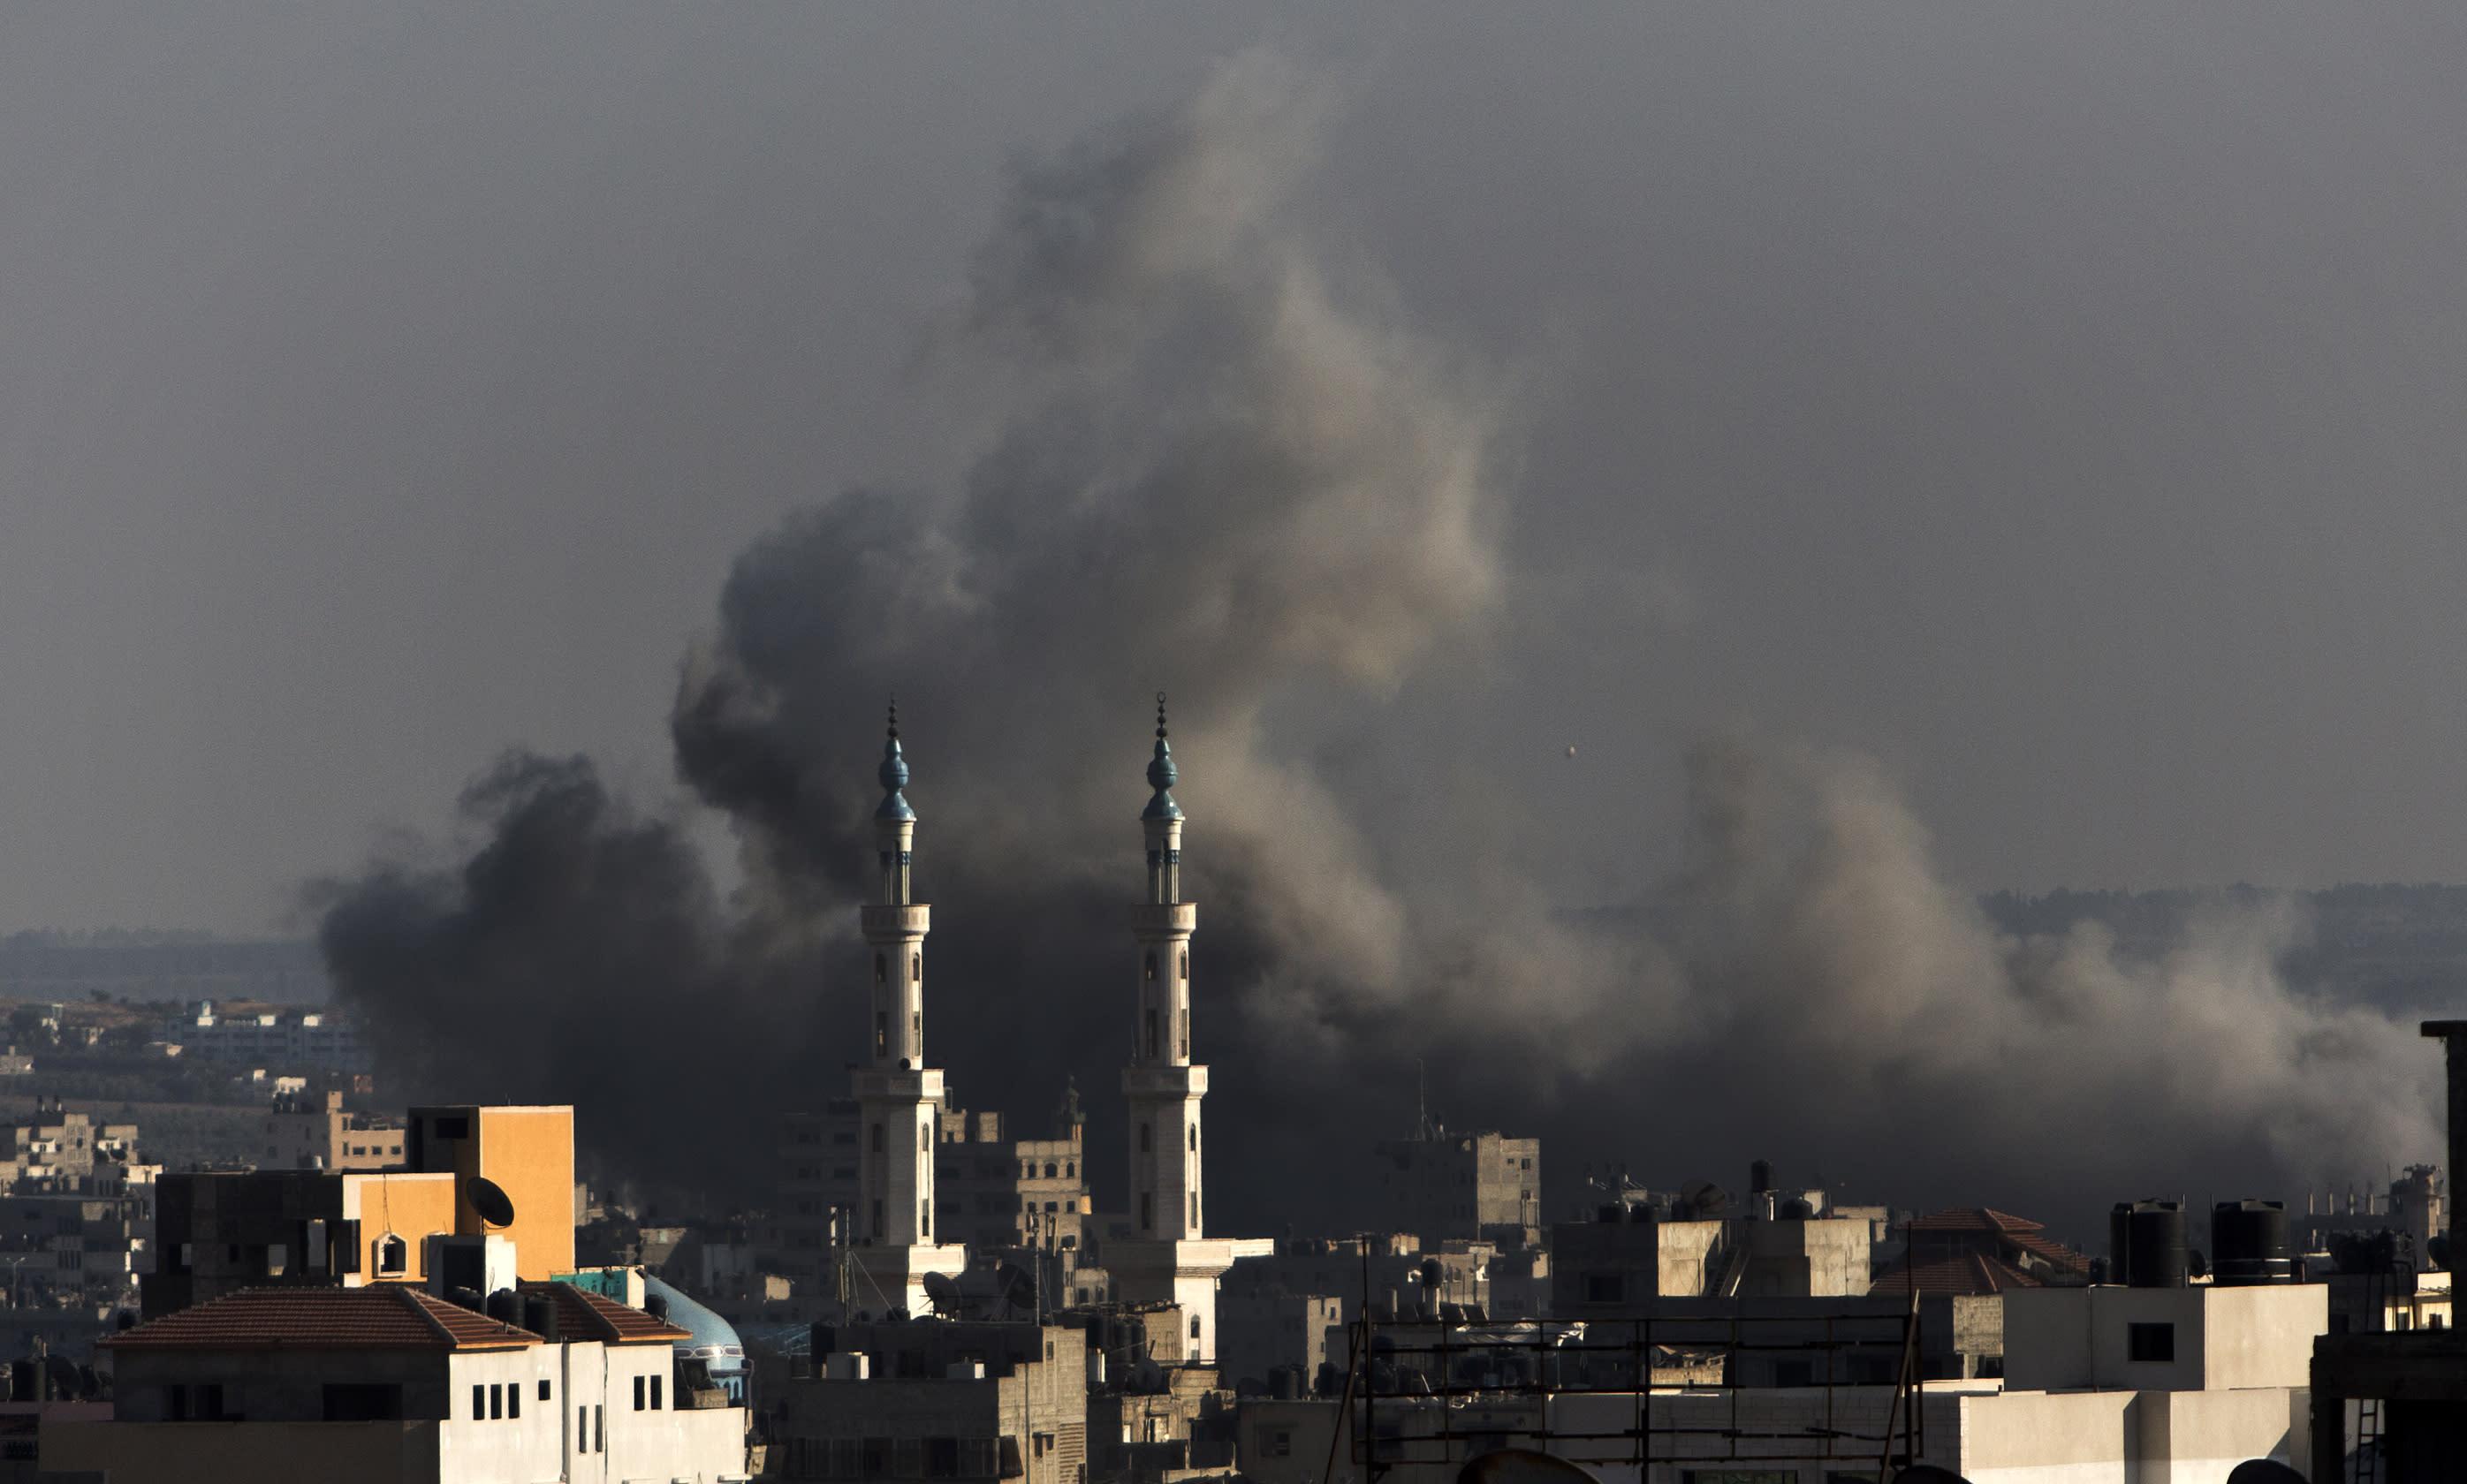 Smoke billows following an Israeli military strike on Gaza City on August 8, 2014 (AFP Photo/Mahmud Hams)